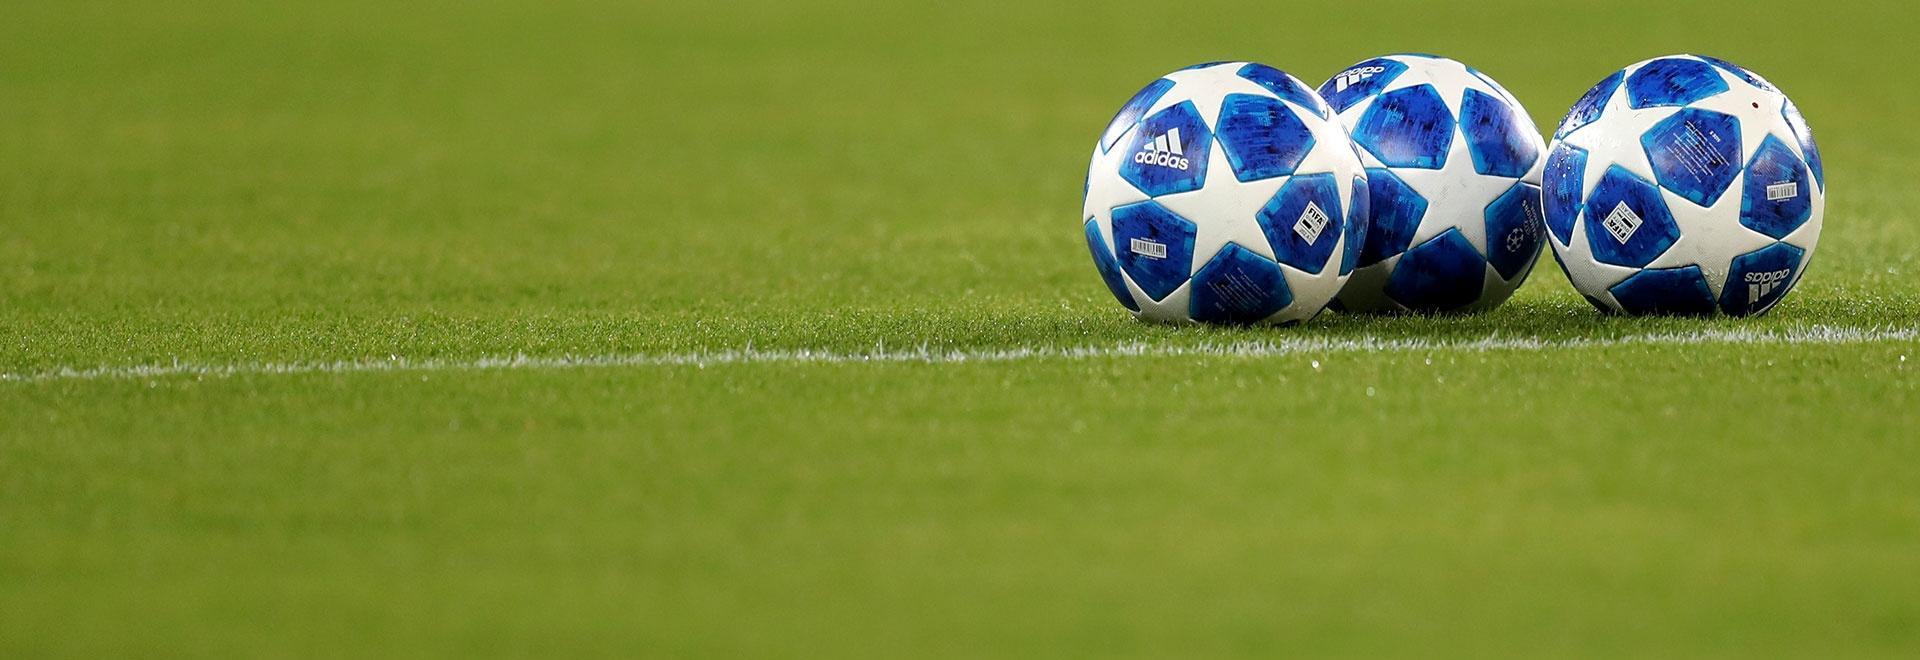 Barcellona - Man Utd 2011. Finale